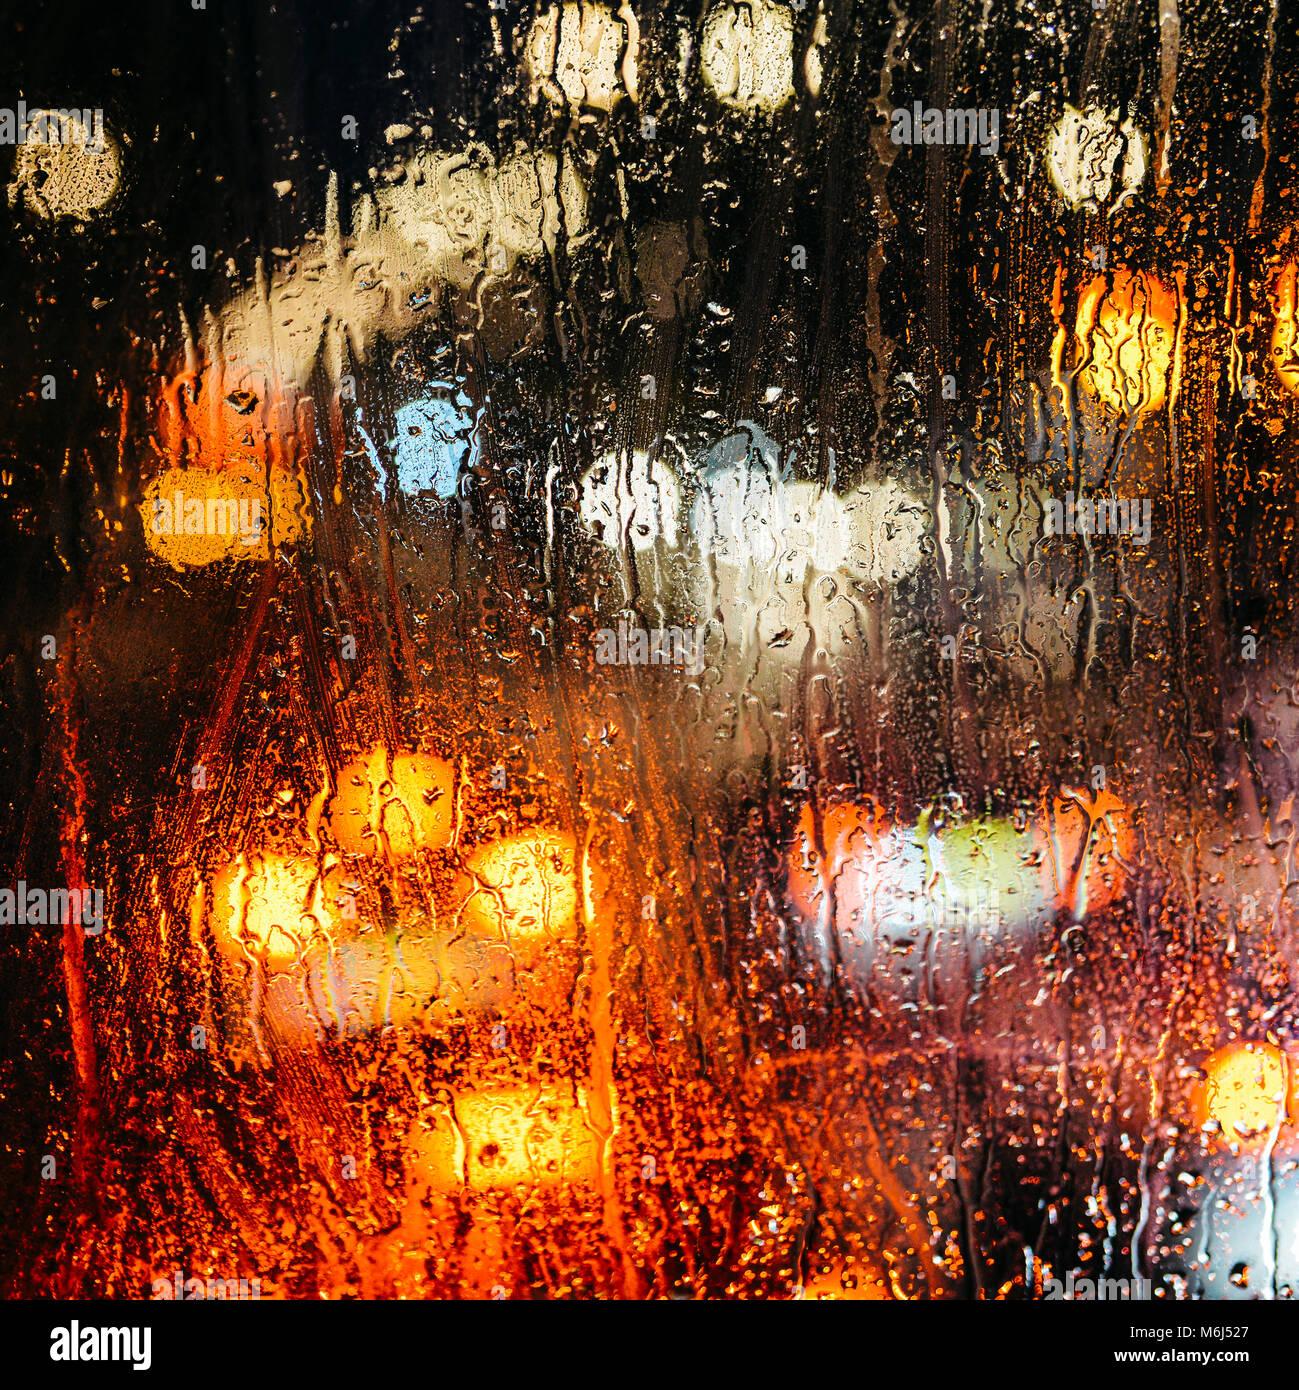 emotional-melancholic-abstract-background-with-defocused-lights-bokeh-M6J527.jpg